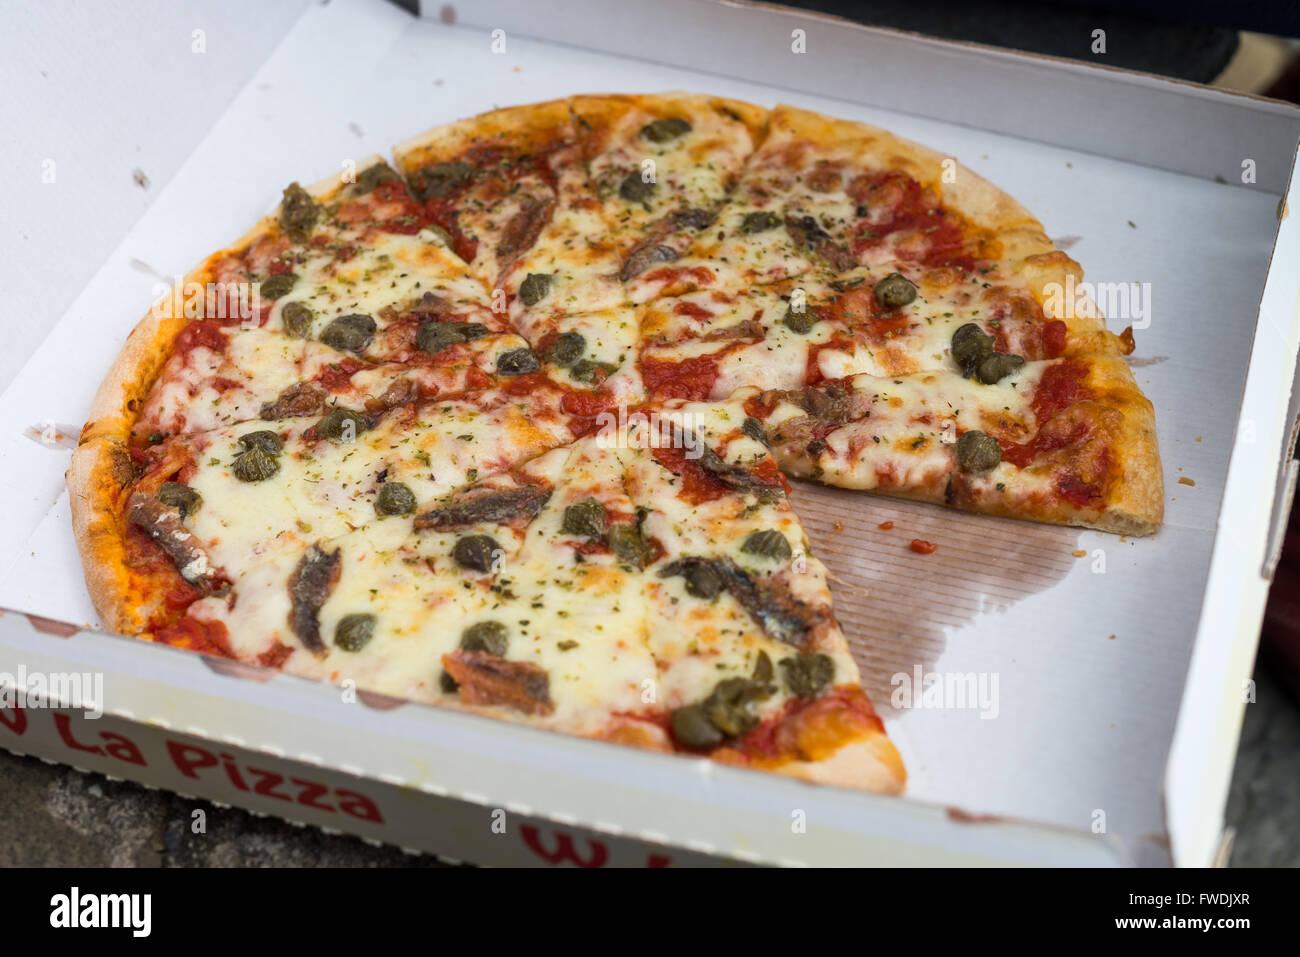 pizza cartoon stockfotos pizza cartoon bilder alamy. Black Bedroom Furniture Sets. Home Design Ideas